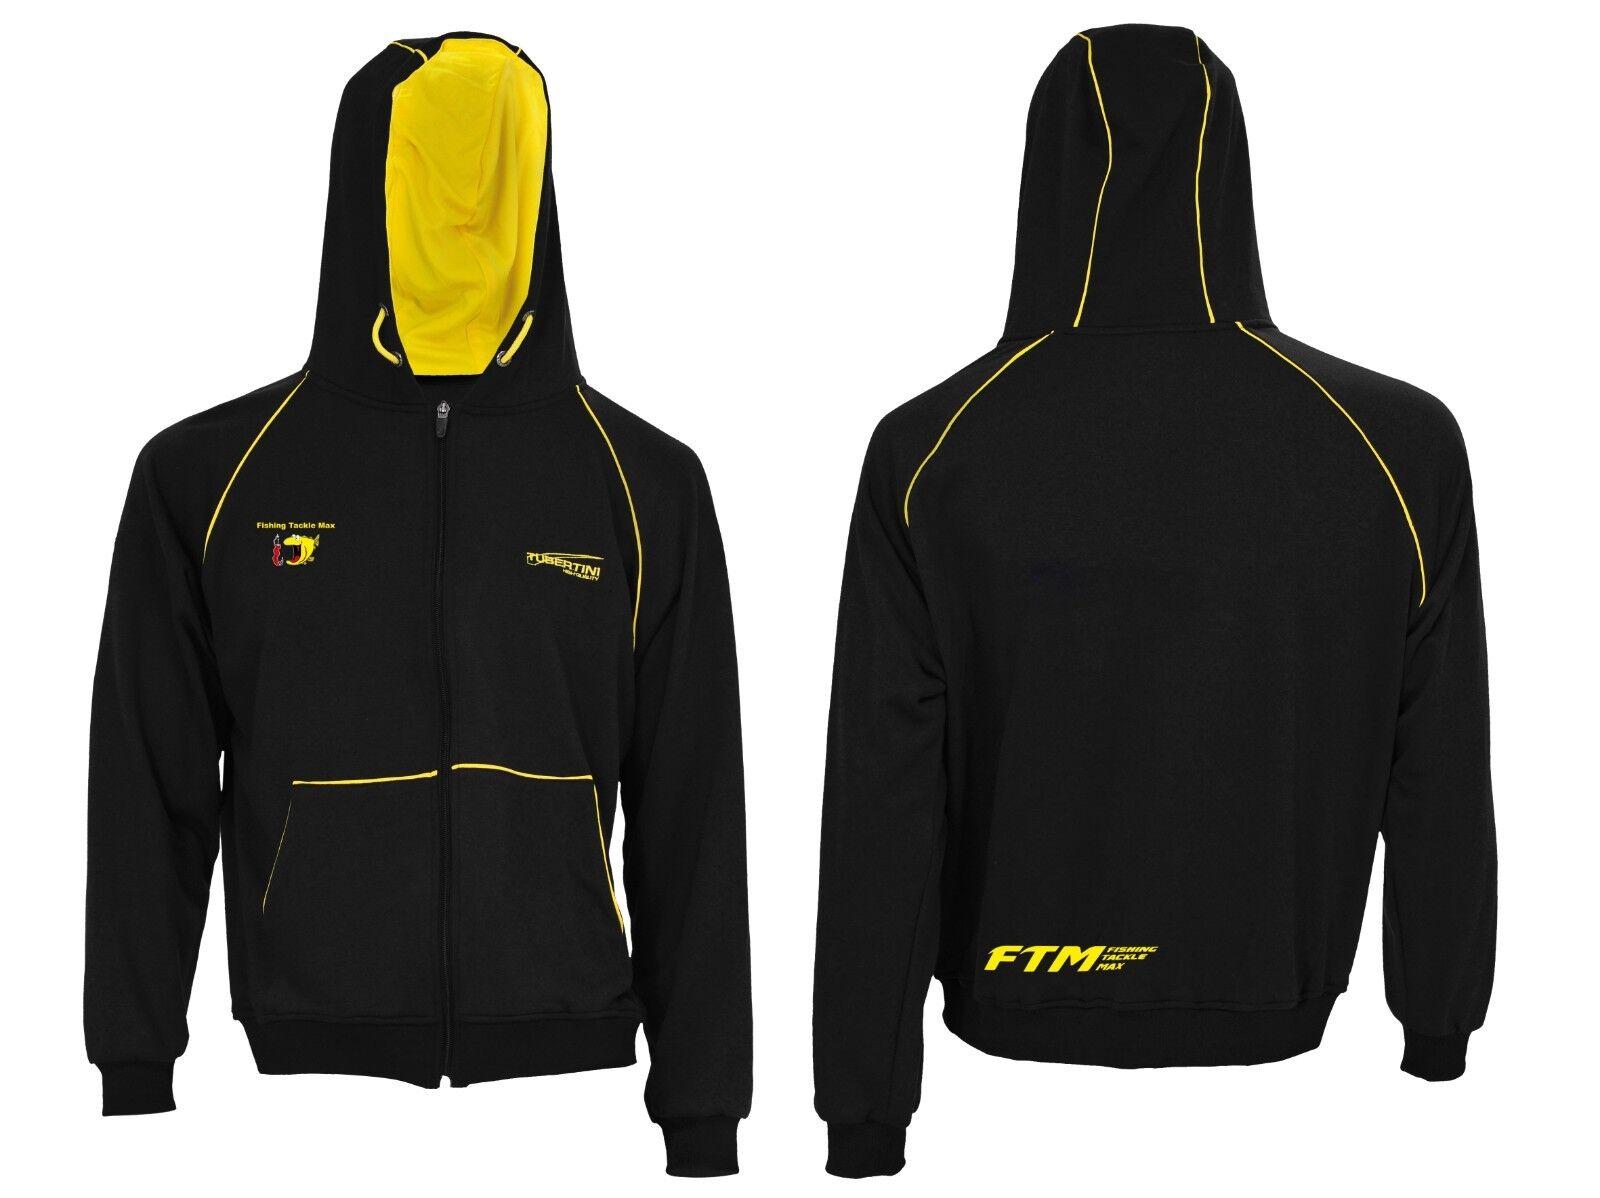 FTM Tubertini fishing  tackle Max chaqueta brand negro diferentes tamaños New     descuento